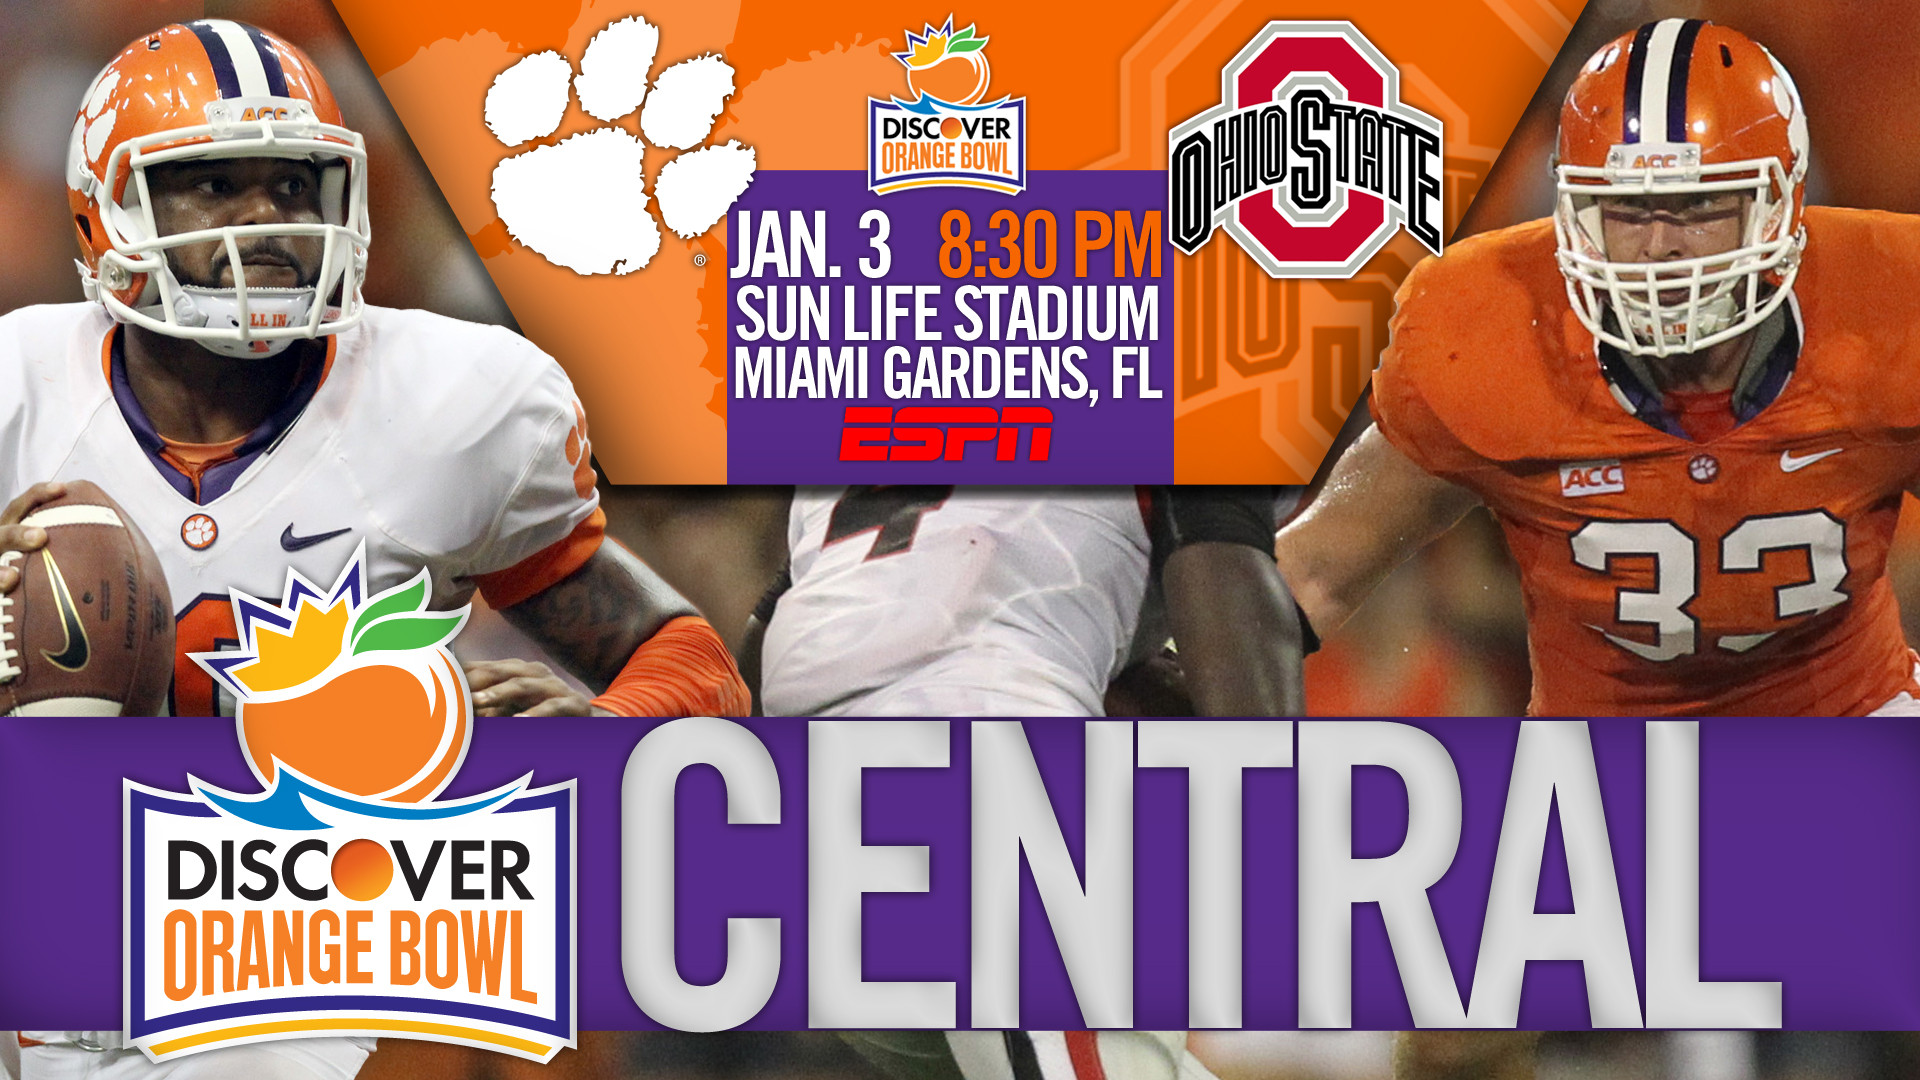 COPY – Clemson vs. Ohio State, 2014 Discover Orange Bowl Central